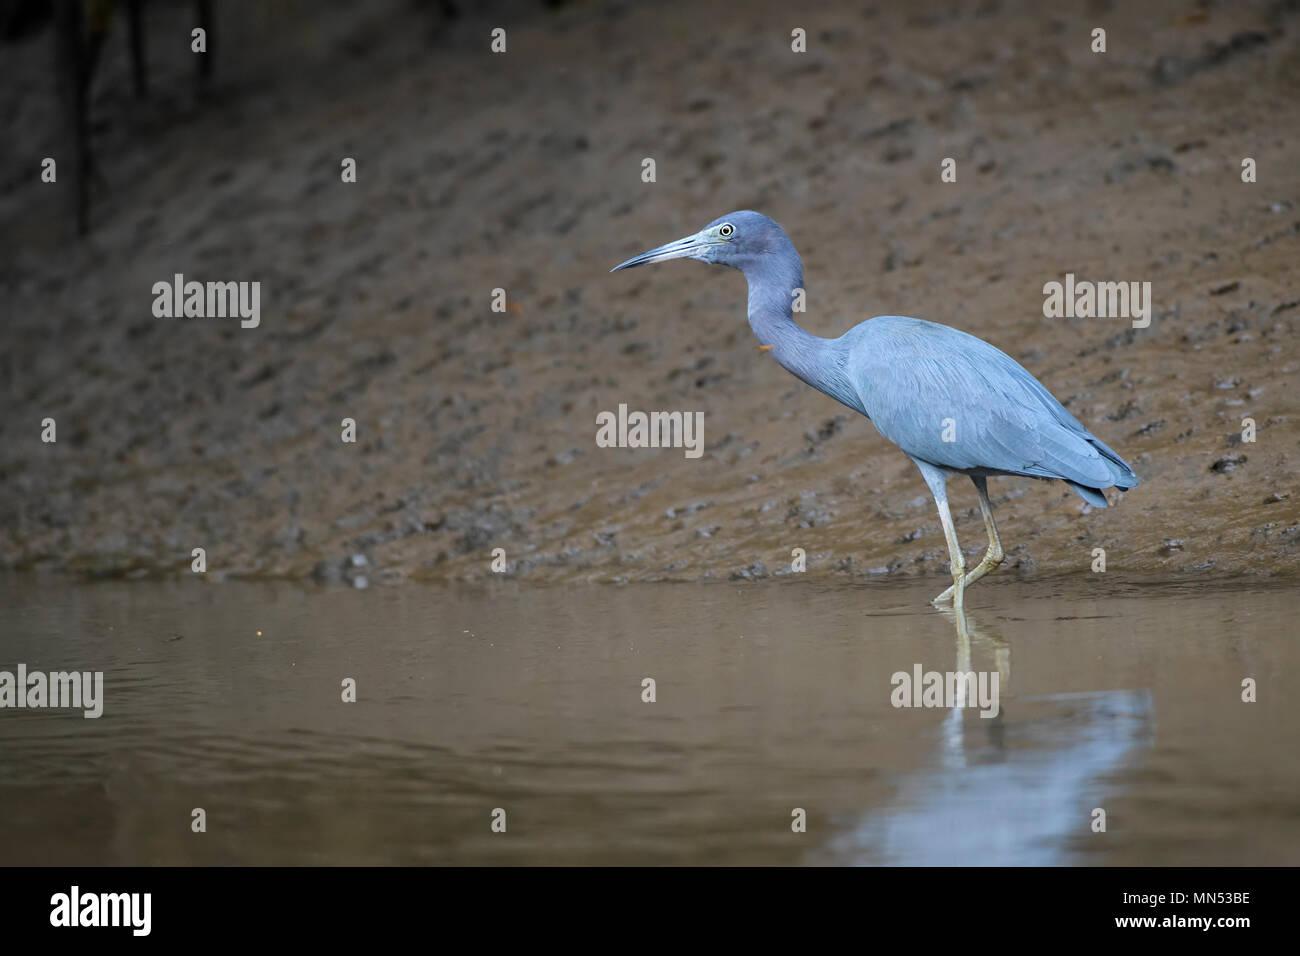 Little Blue Heron - Egretta caerulea, blue gray heron from New World fresh waters and mangrove, Costa Rica. - Stock Image